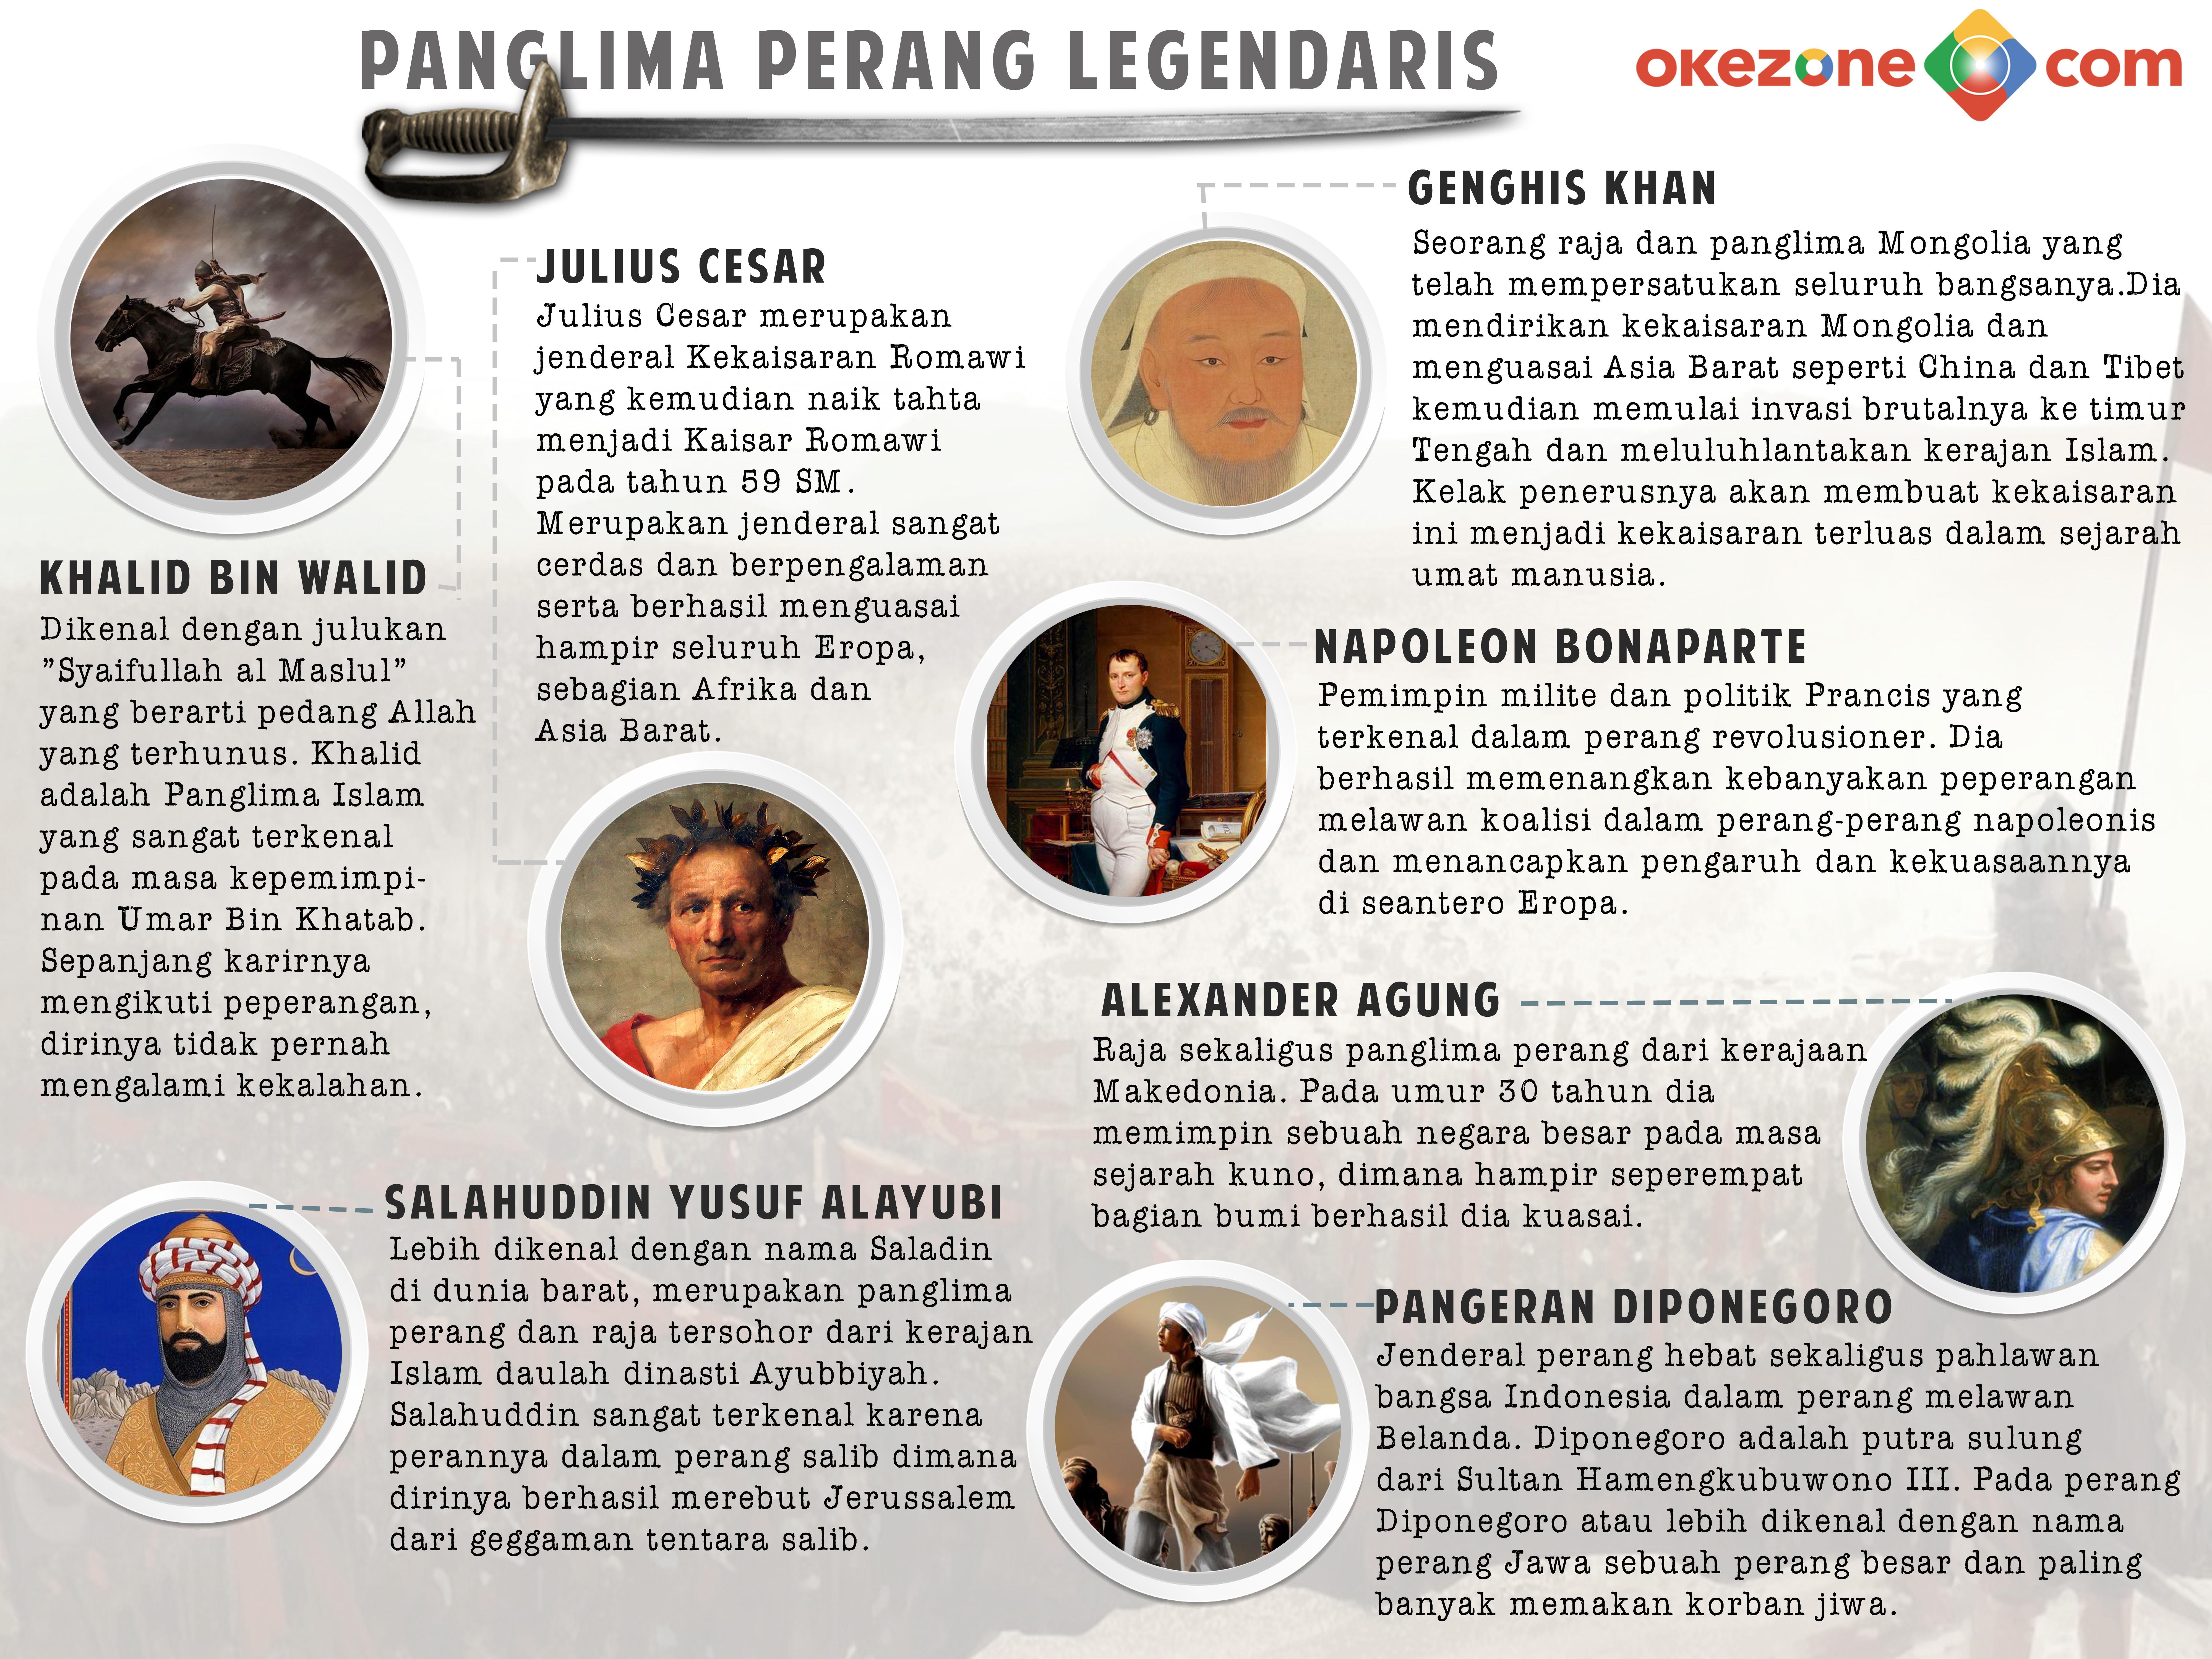 PANGLIMA PERANG LEGENDARIS -